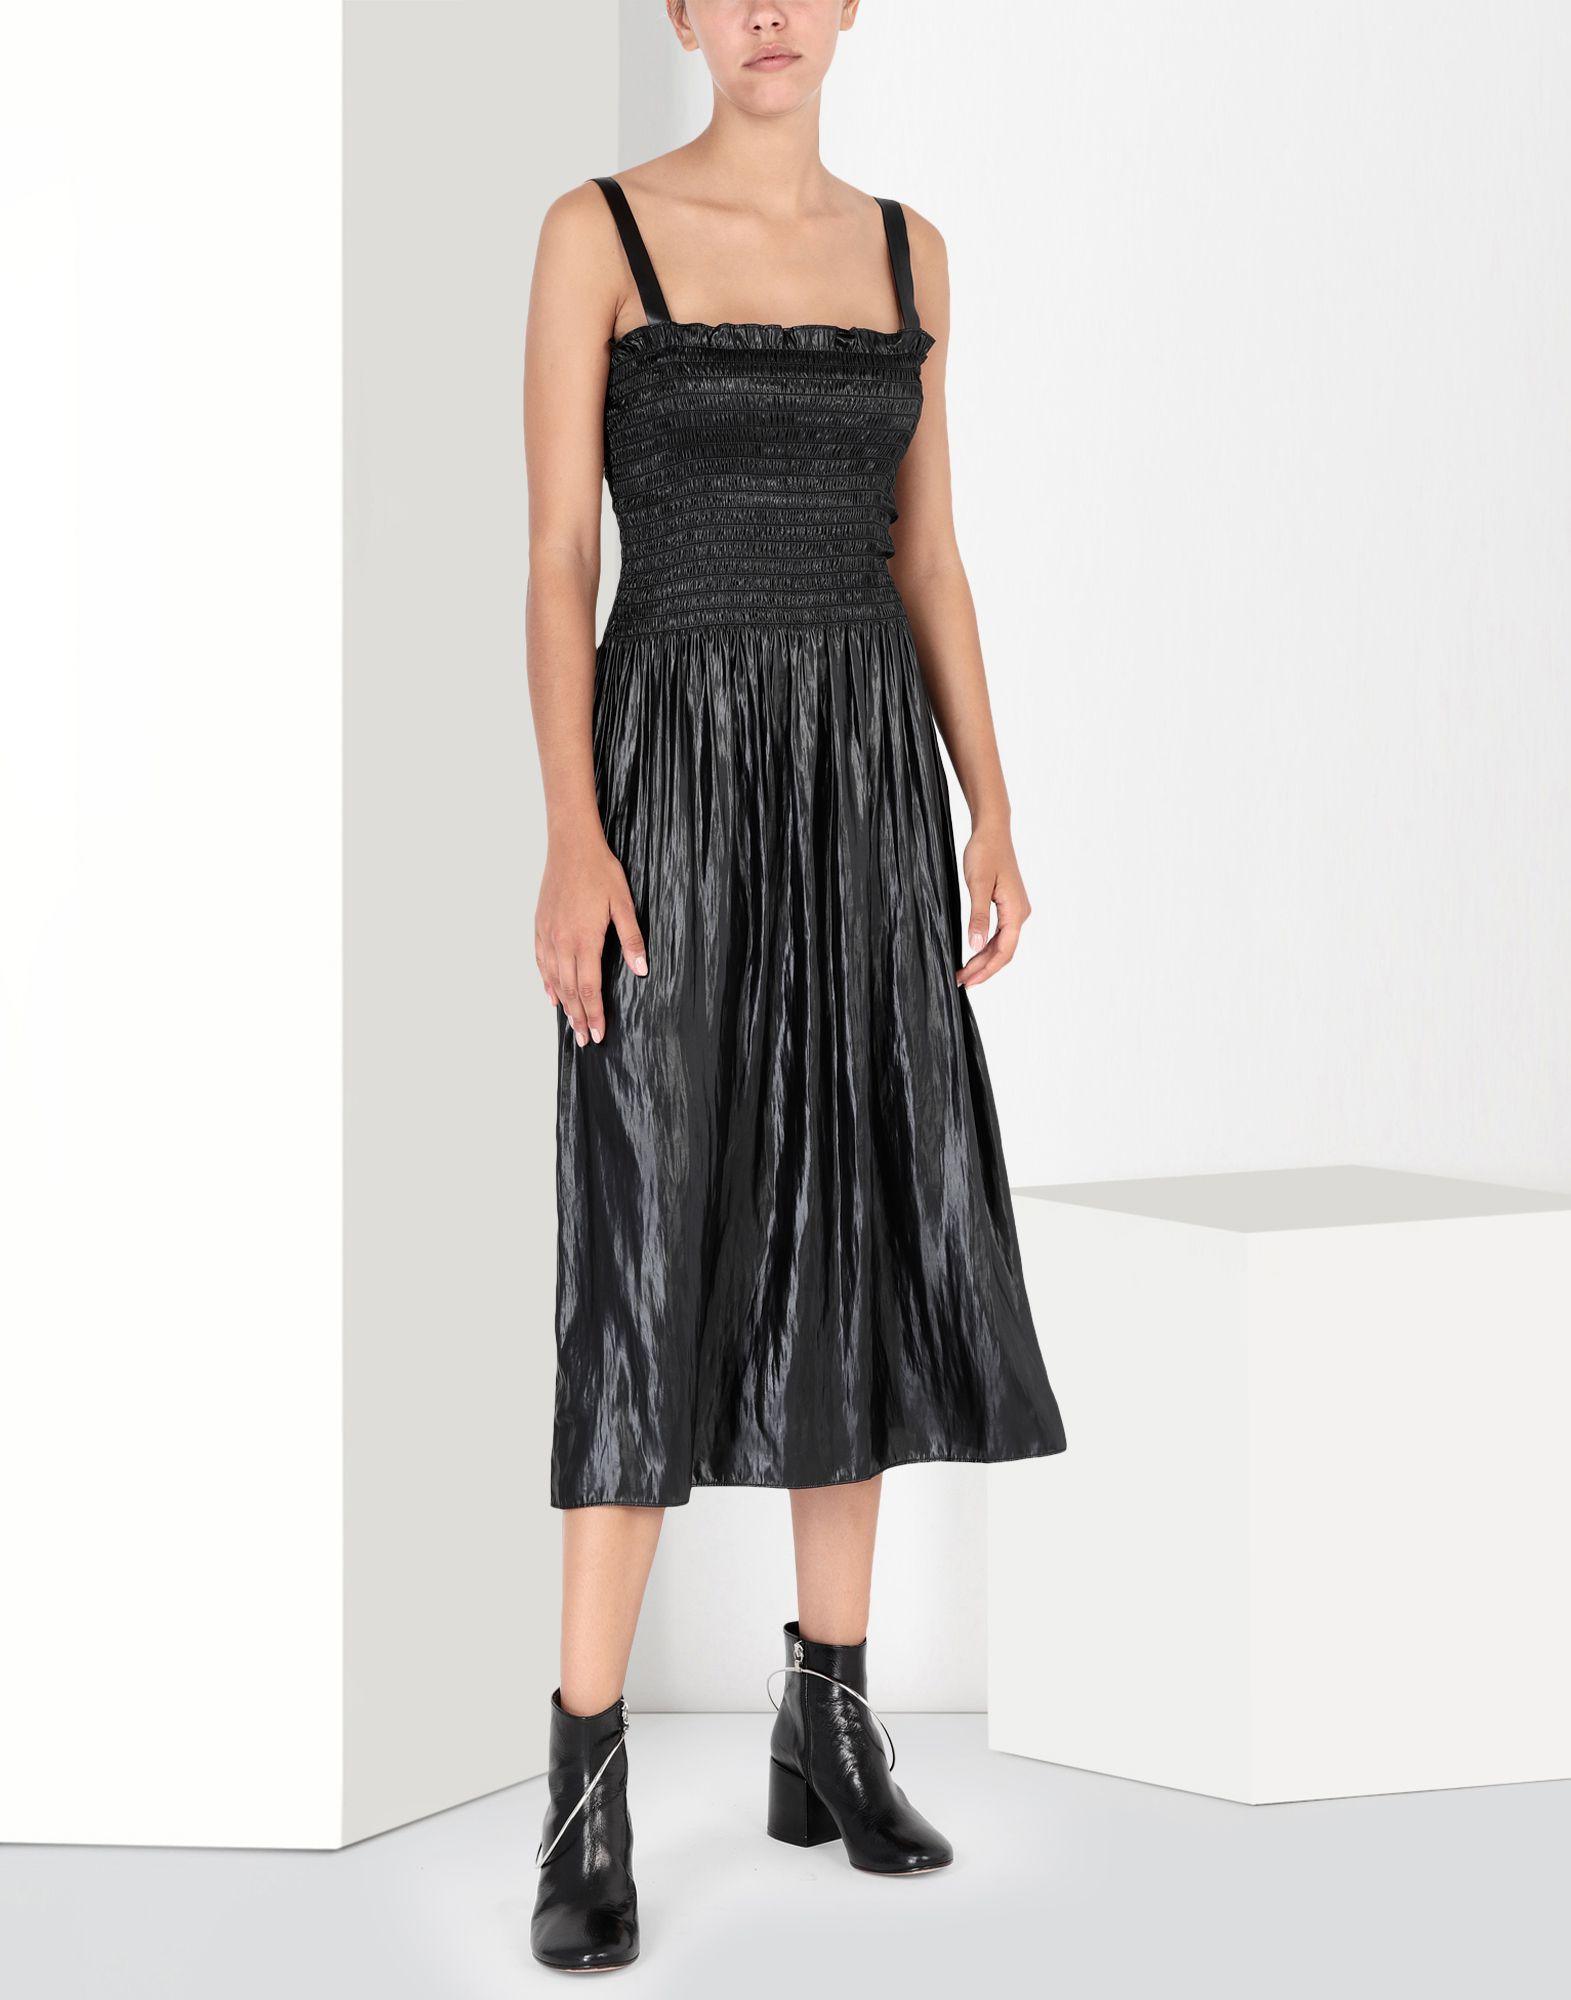 MM6 MAISON MARGIELA Fluid satin dress 3/4 length dress Woman f